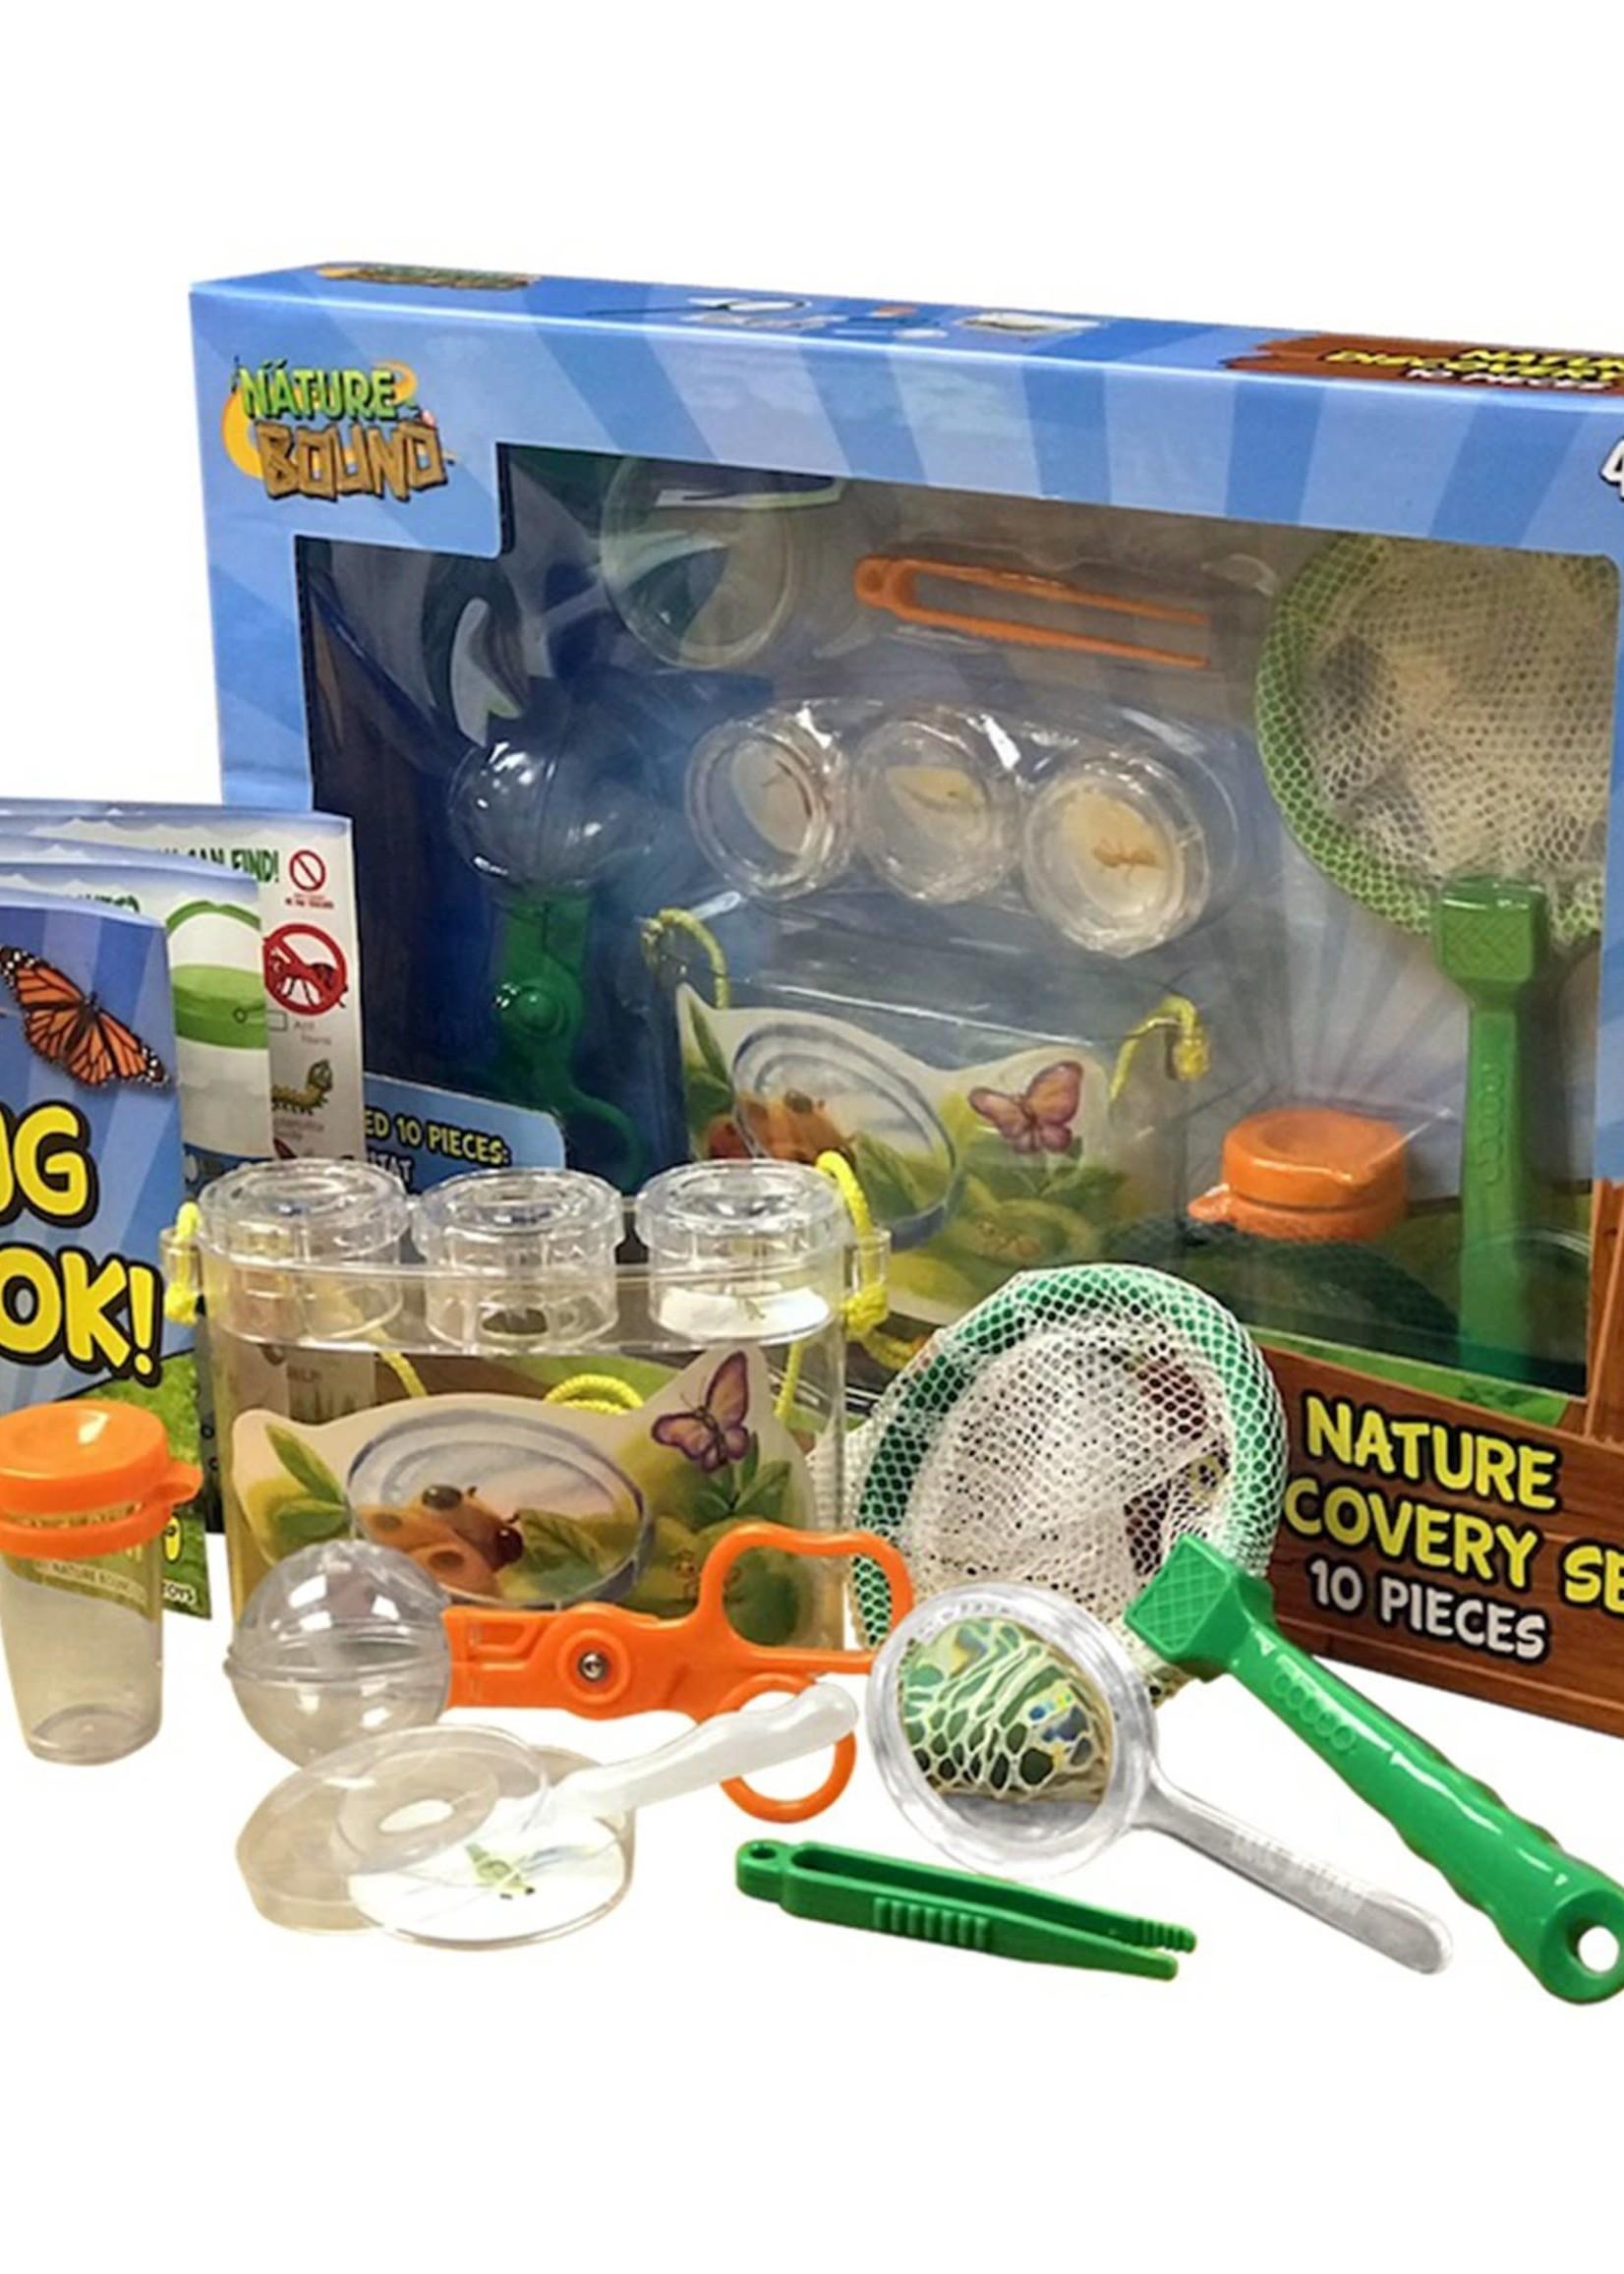 Nature Discovery Bug Catcher 6 piece set